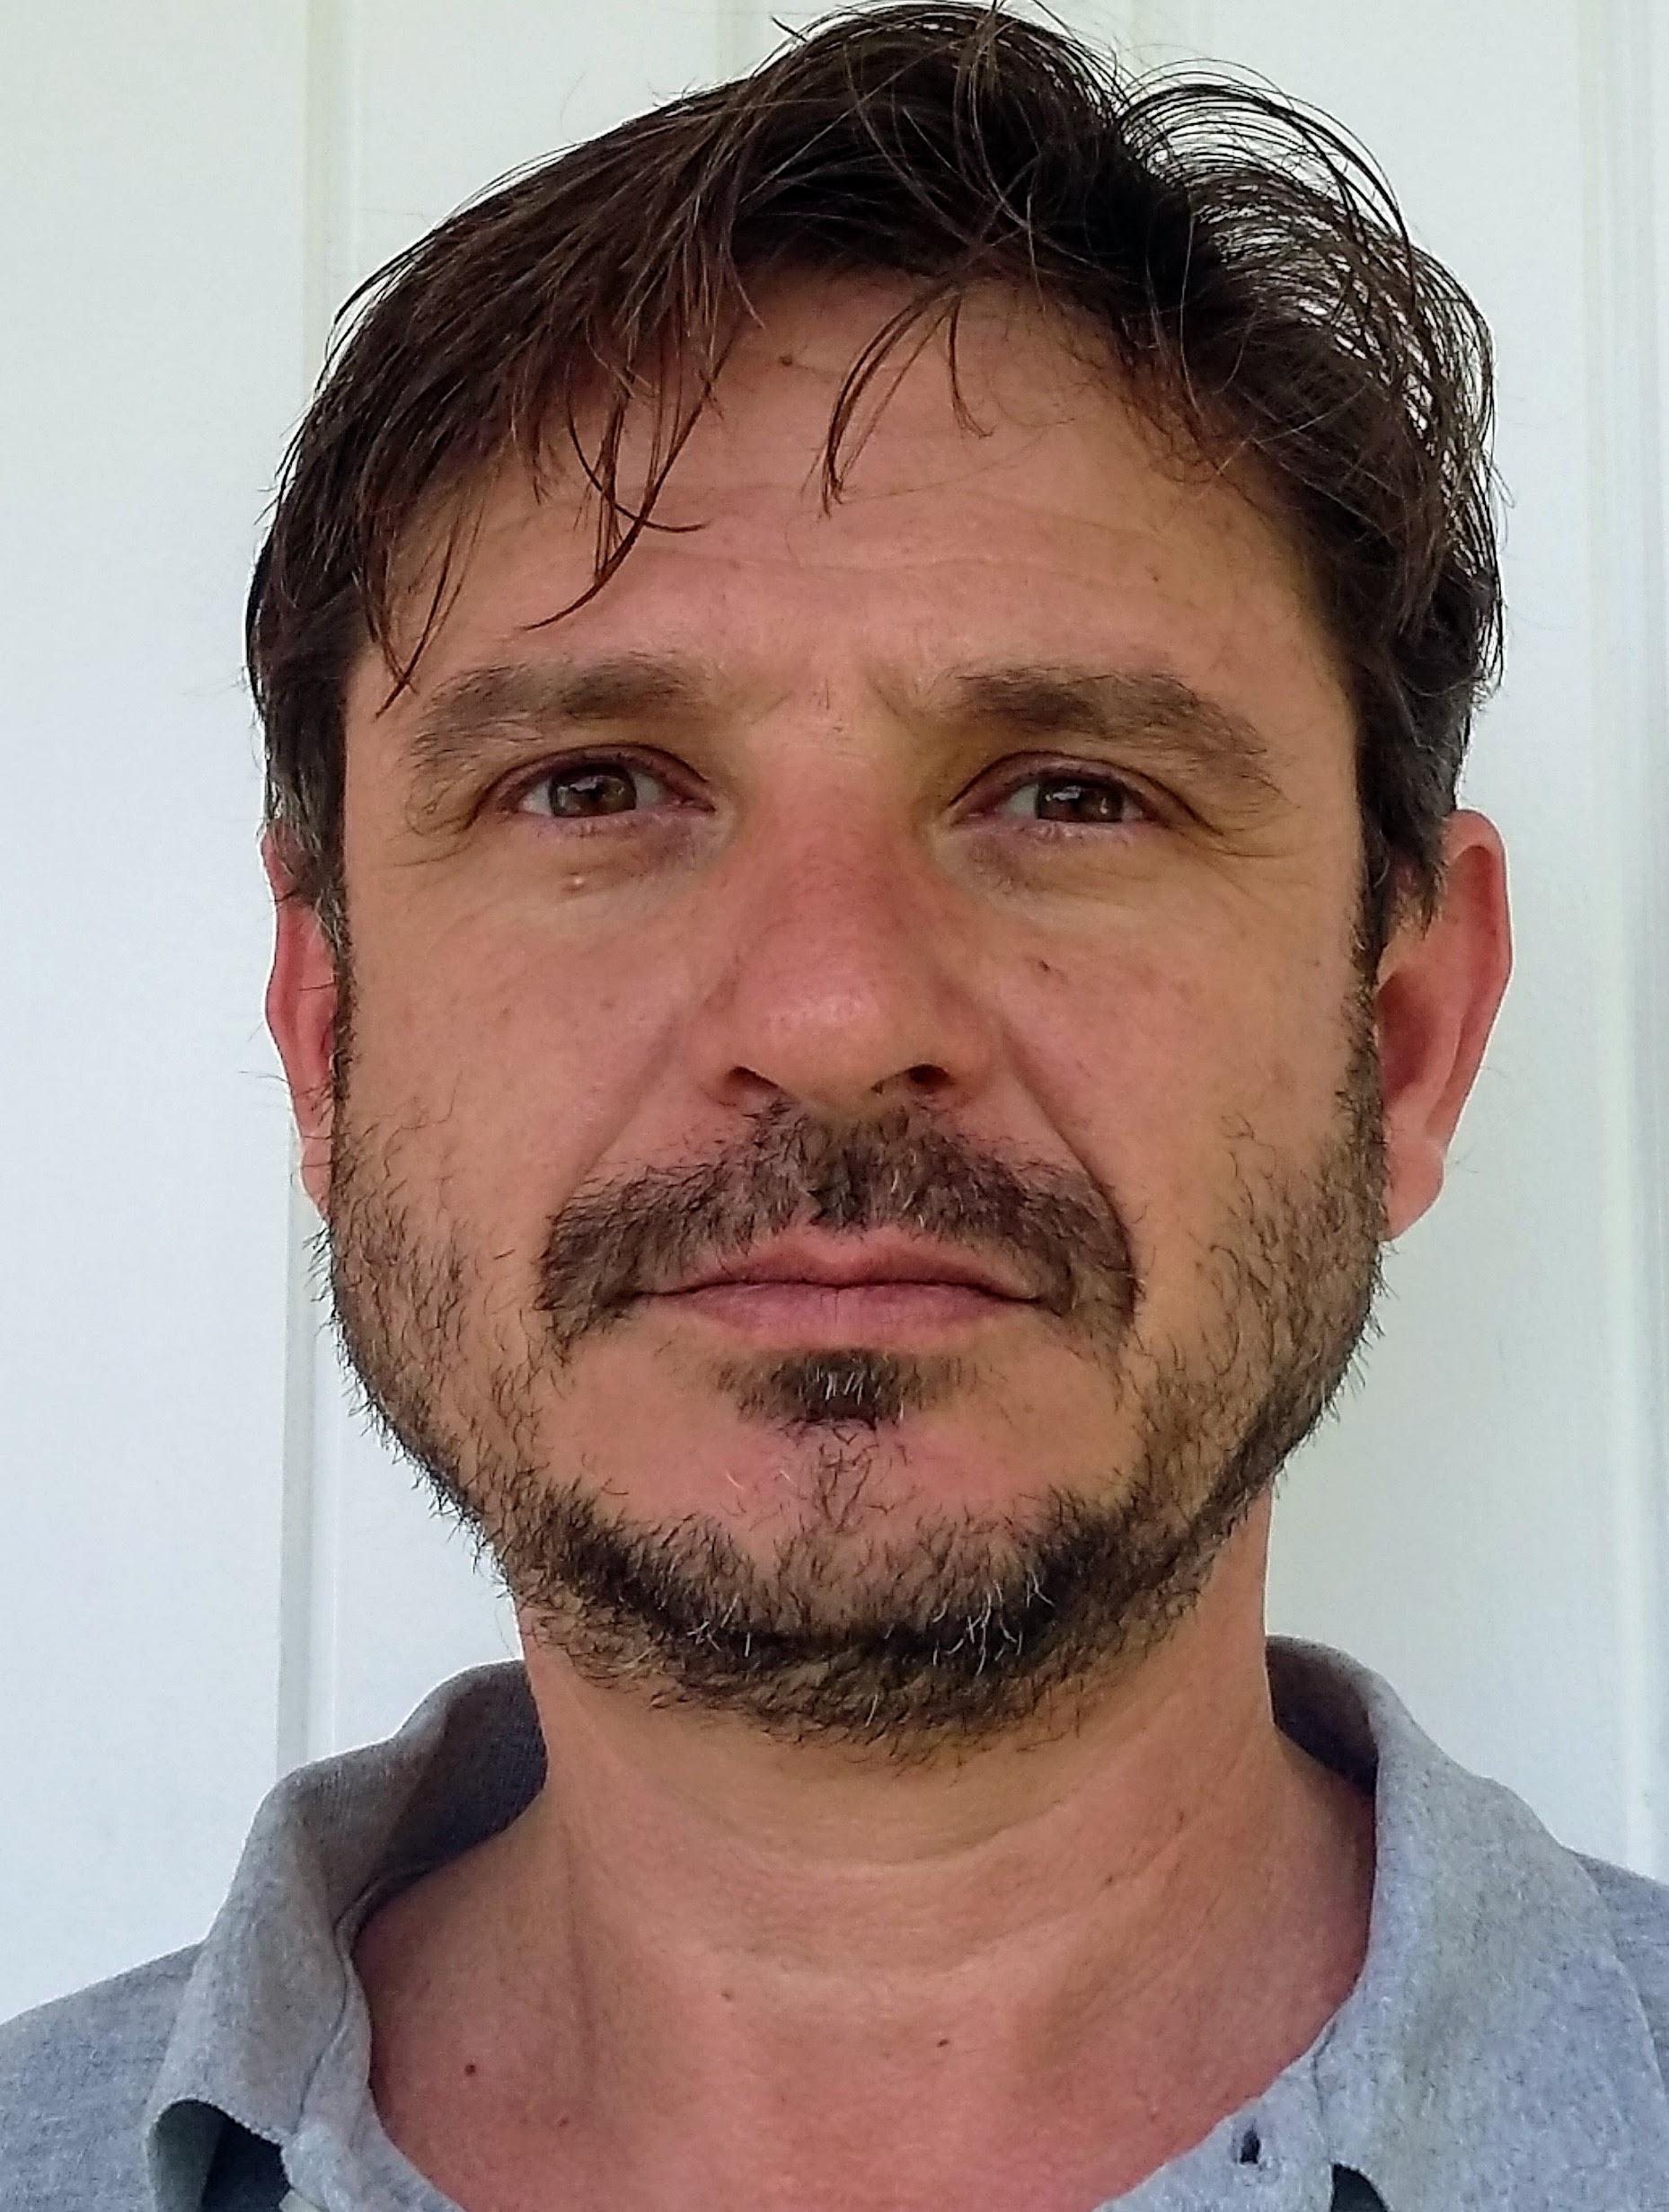 Philippe Juliany